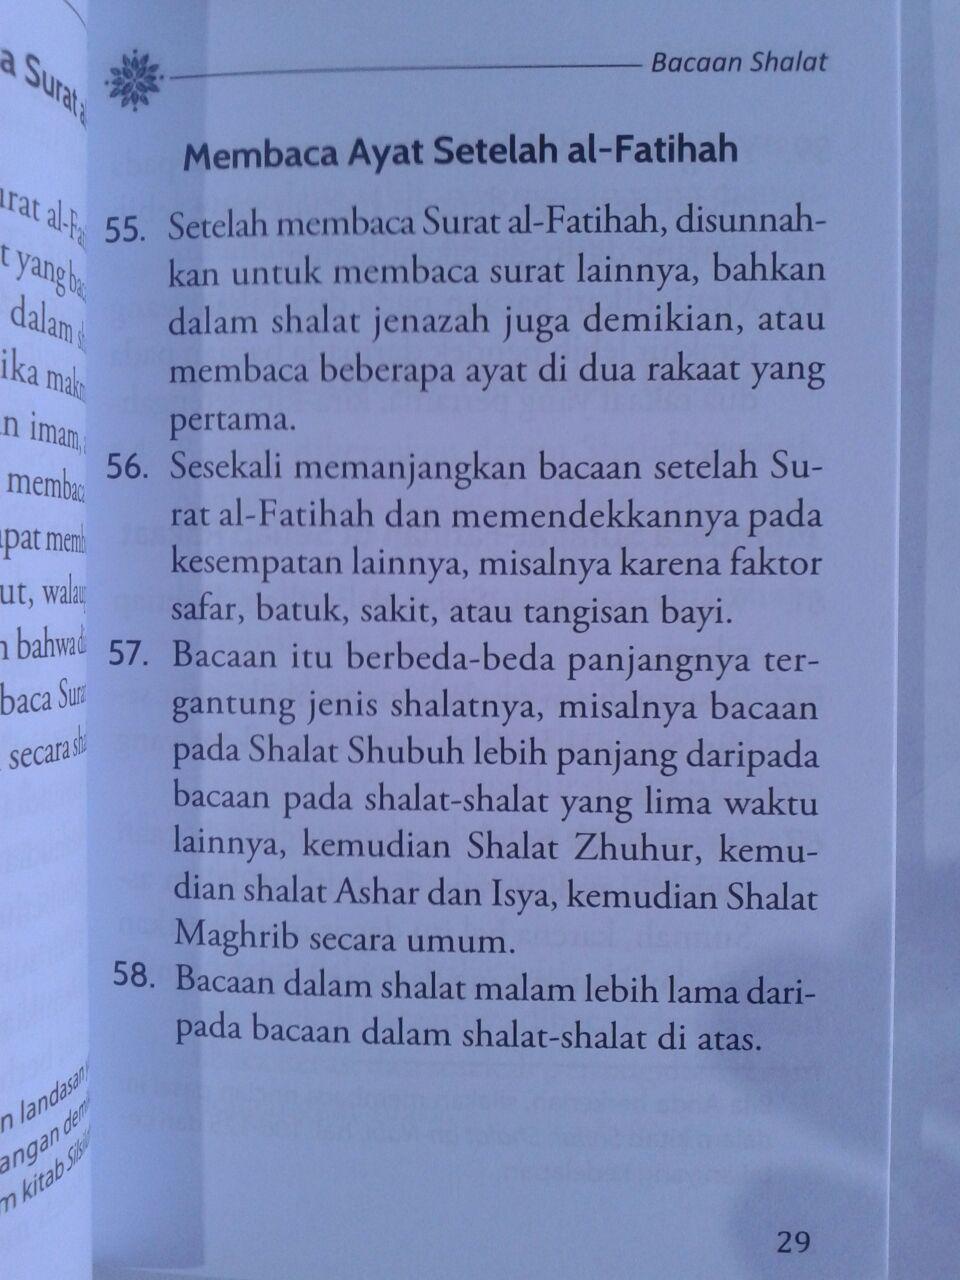 Buku Ringkasan Sifat Shalat Nabi Syaikh Al-Albani isi